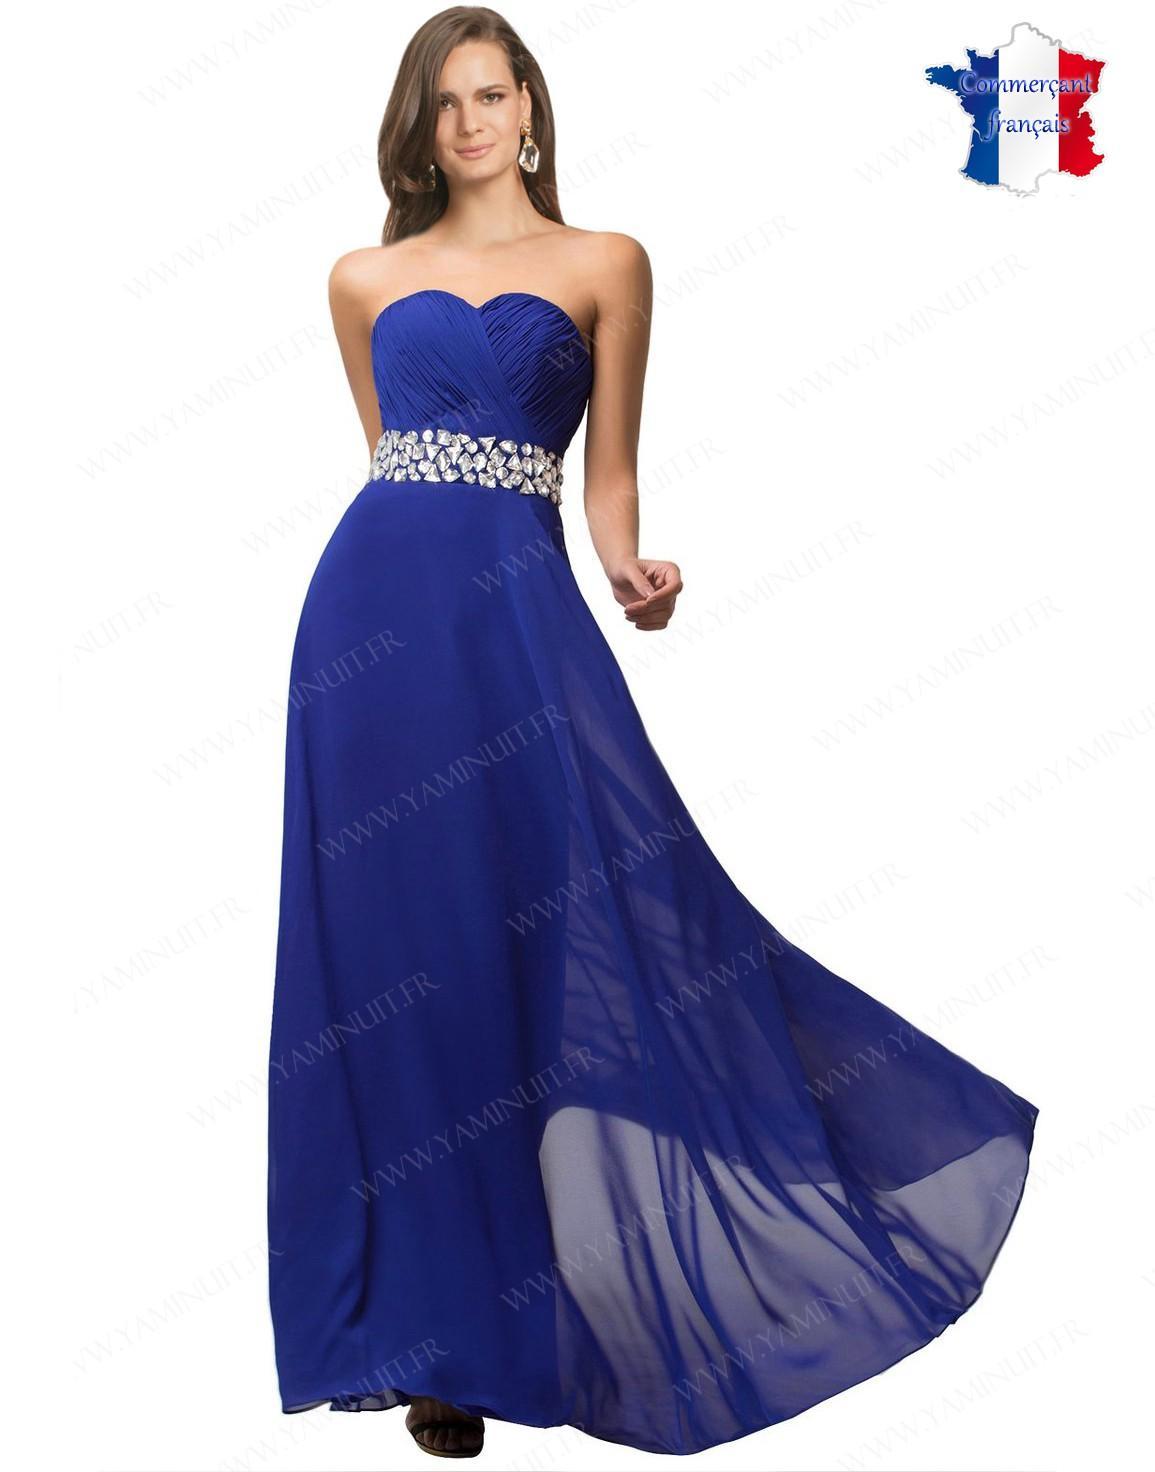 Robe de ceremonie bleu roi